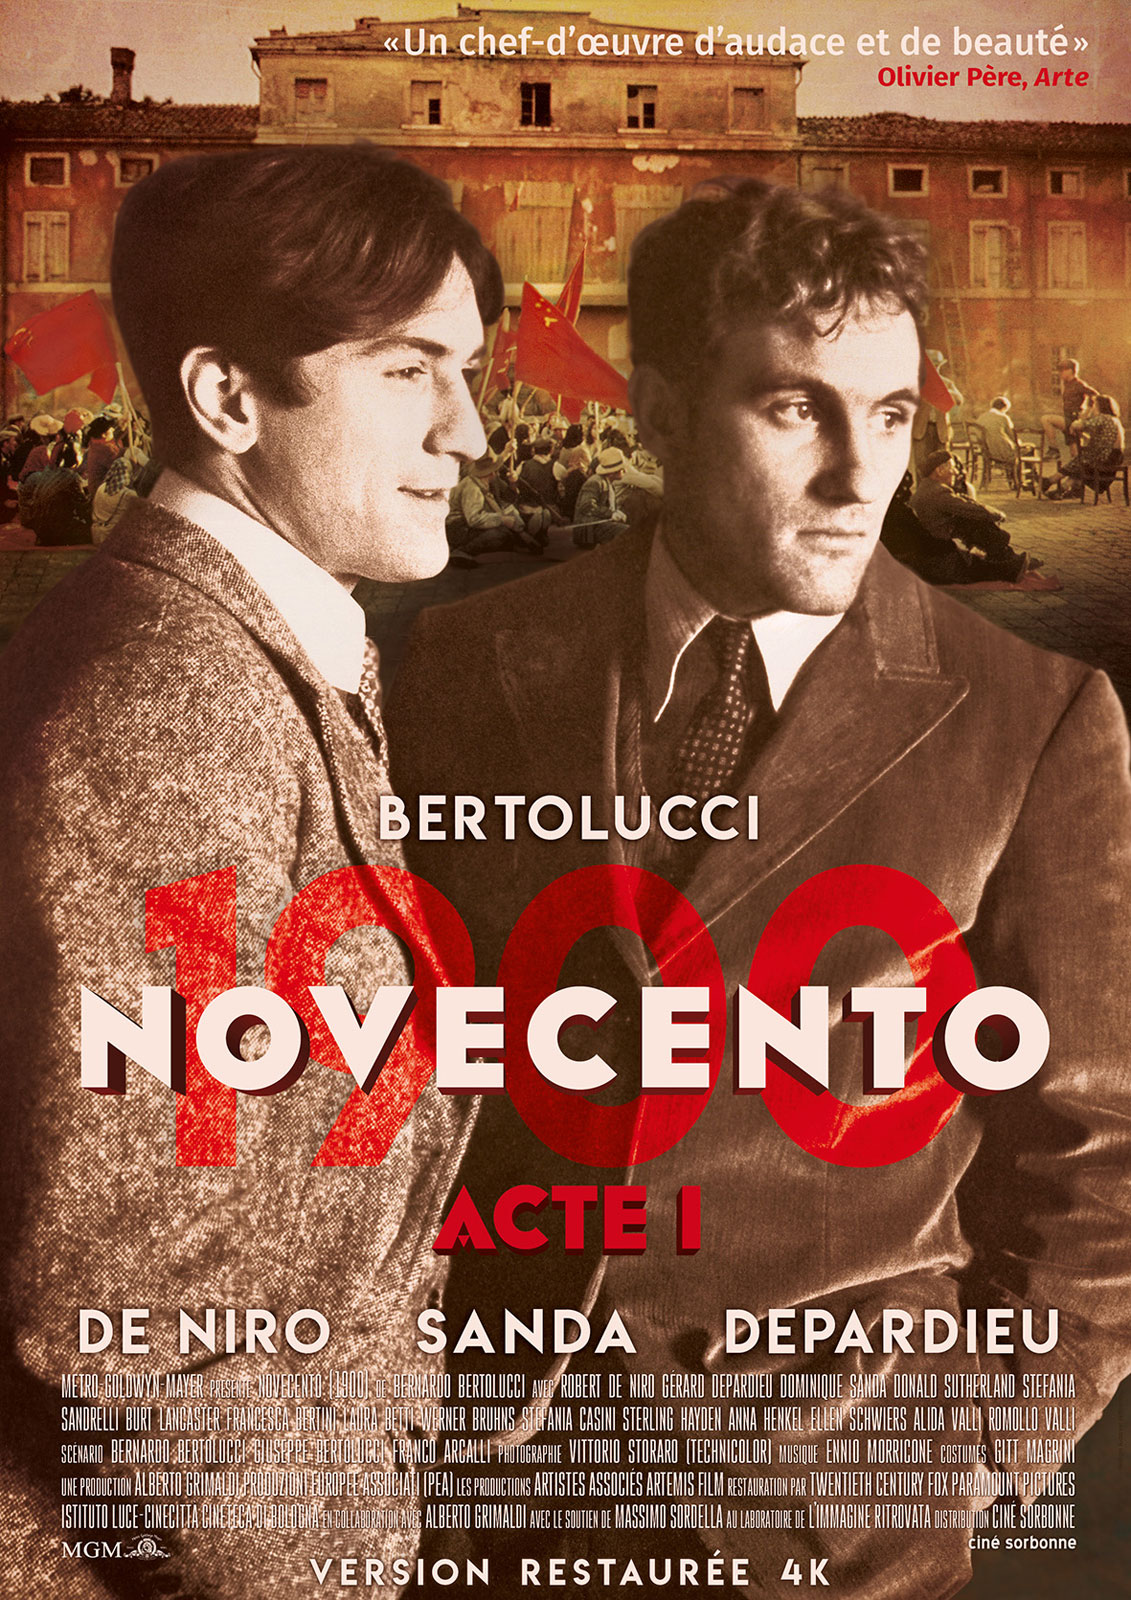 Image du film Novecento (1900) - Acte I